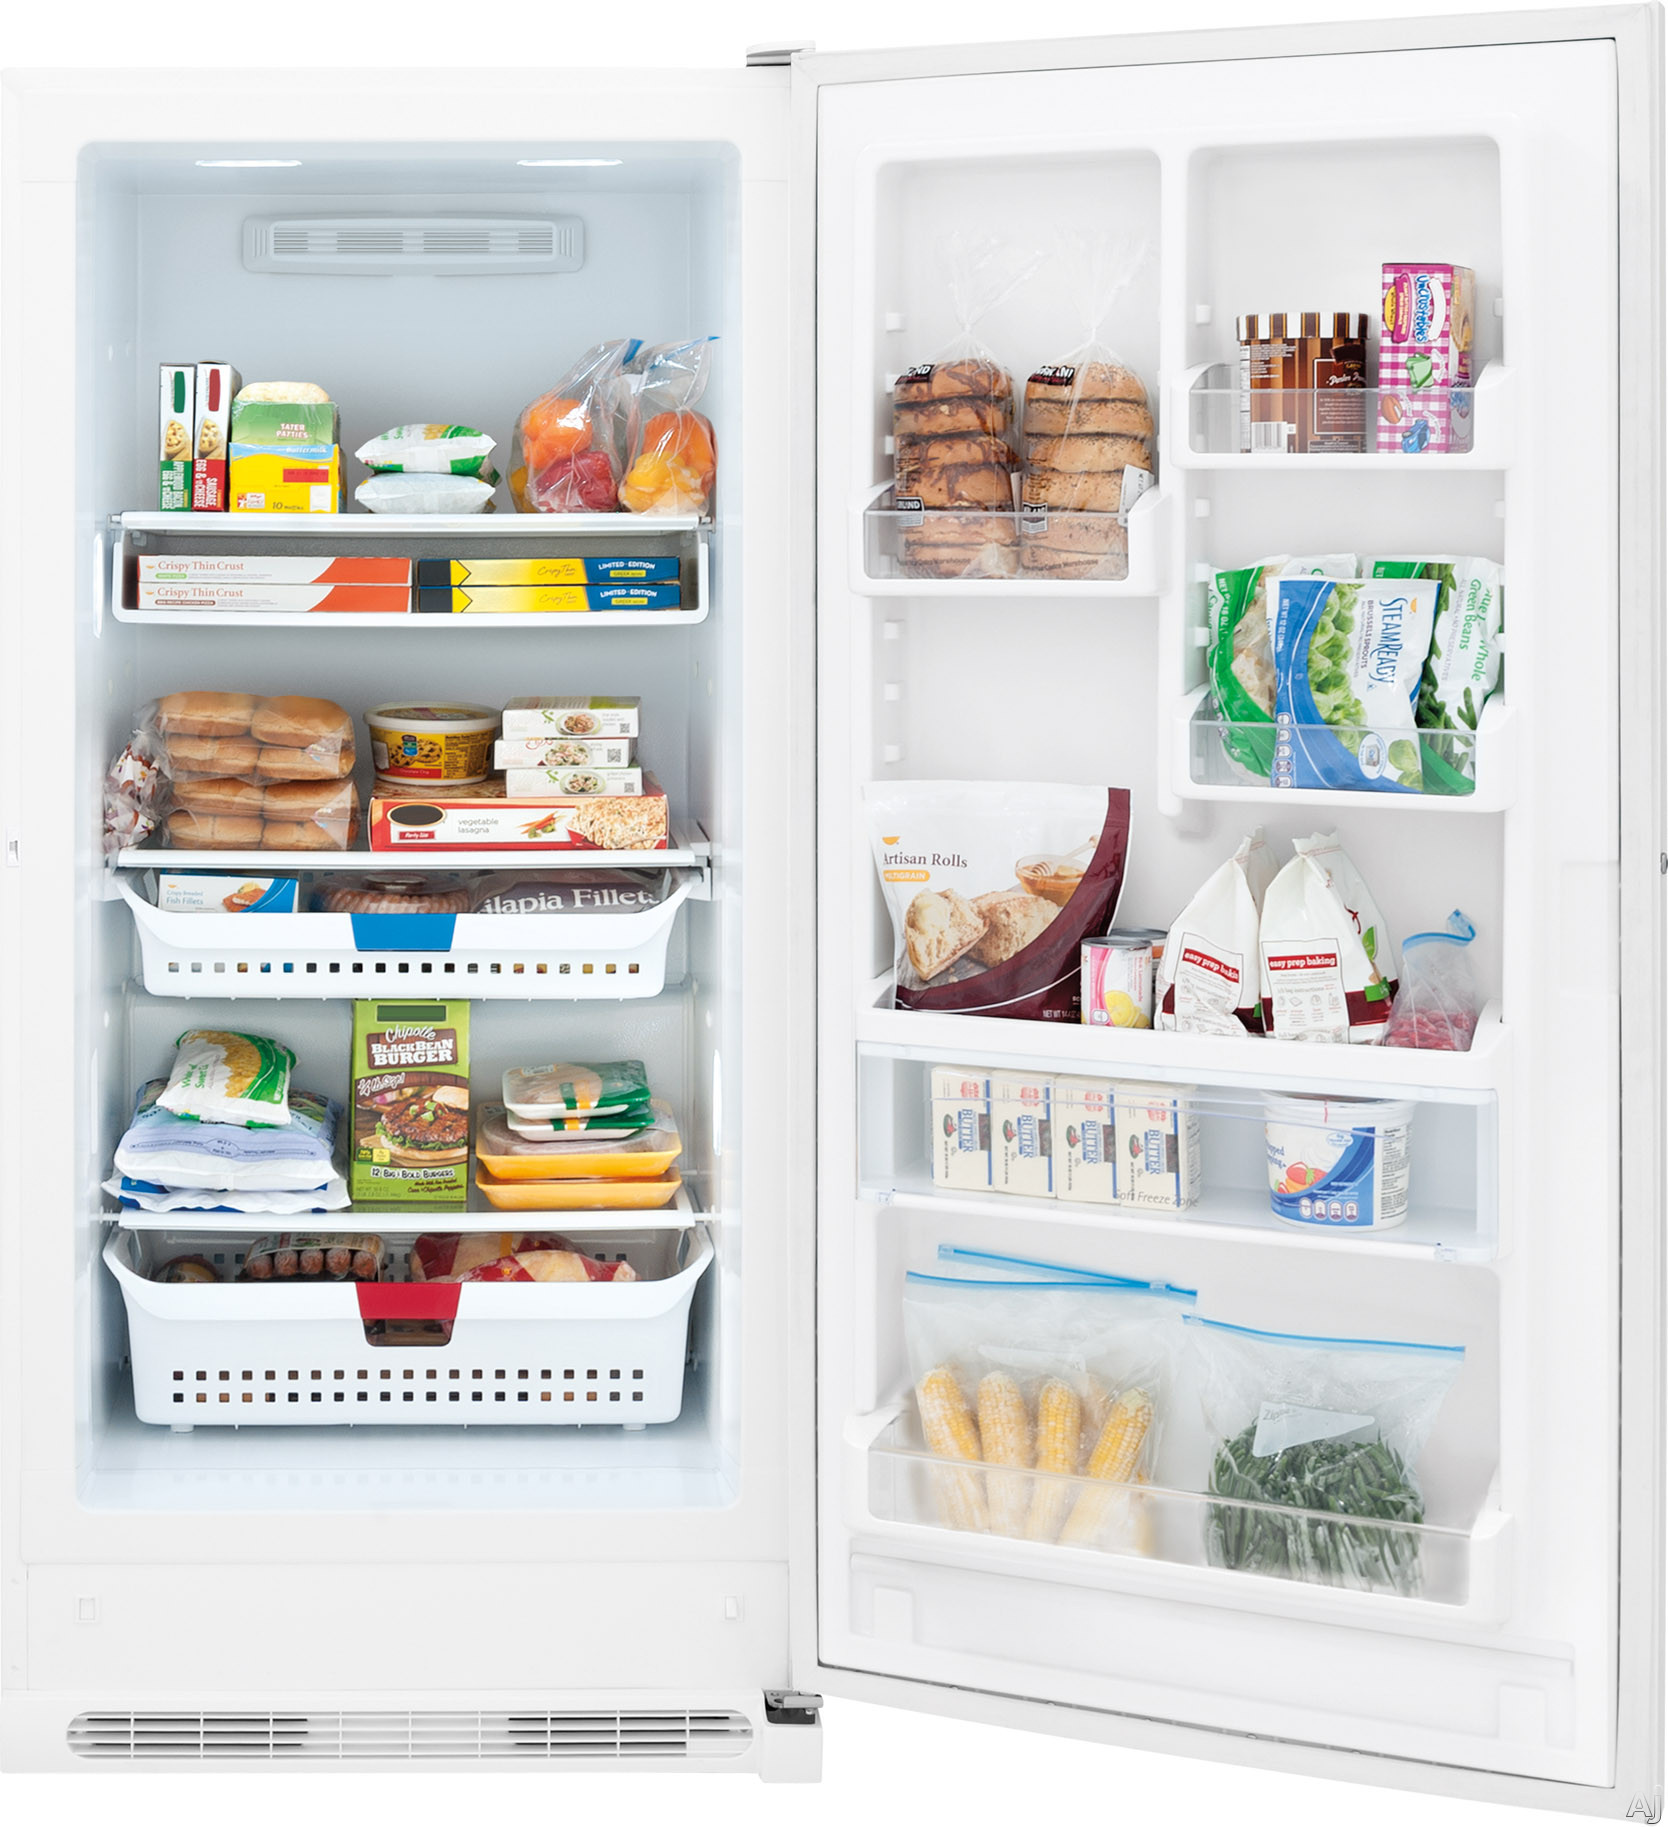 Frigidaire Fffh17f6qw 16 85 Cu Ft Upright Freezer With 3